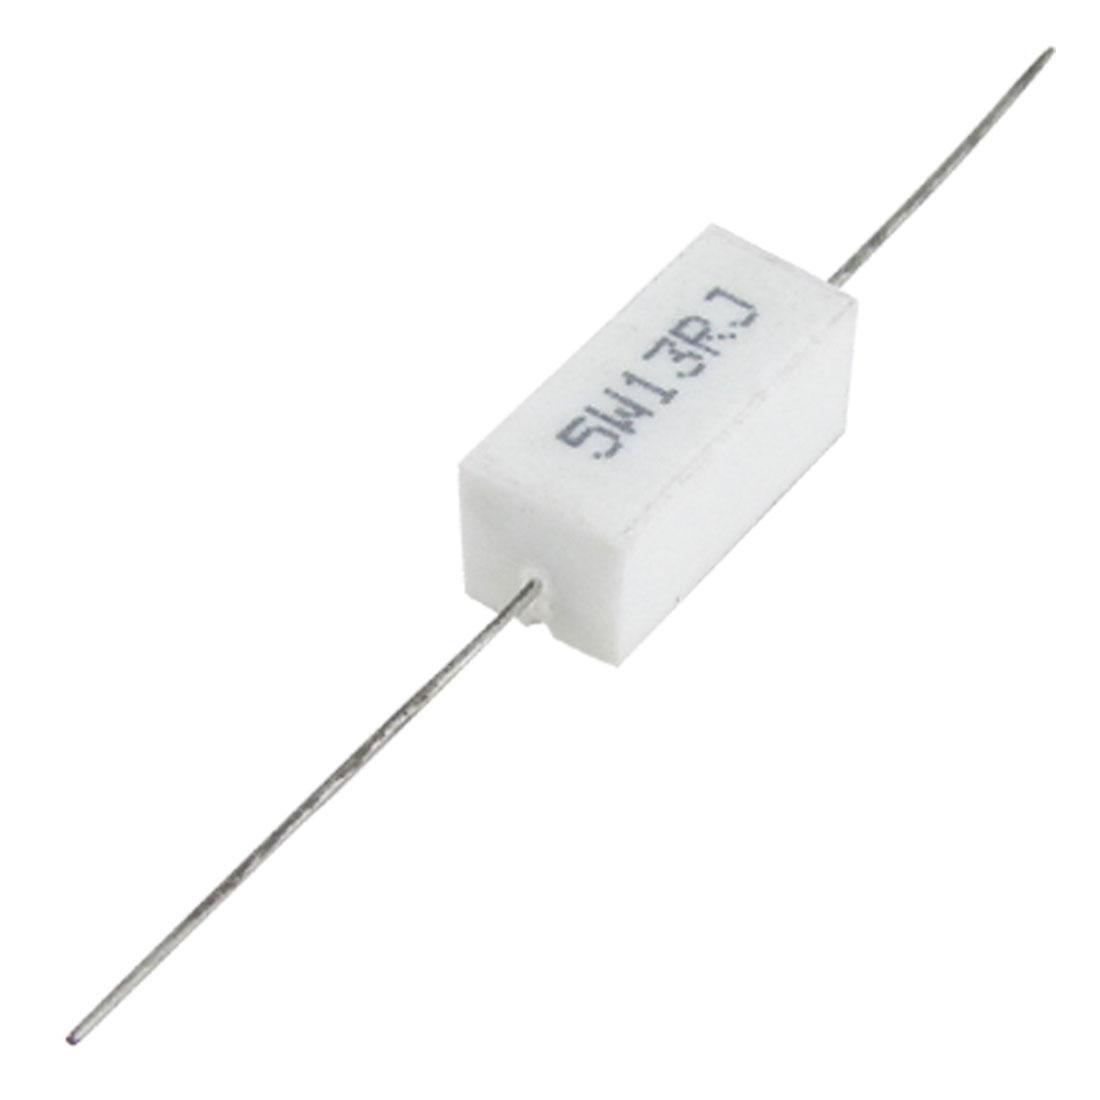 5W Watt 13 Ohm 5% Wirewound Ceramic Cement Resistor x 10